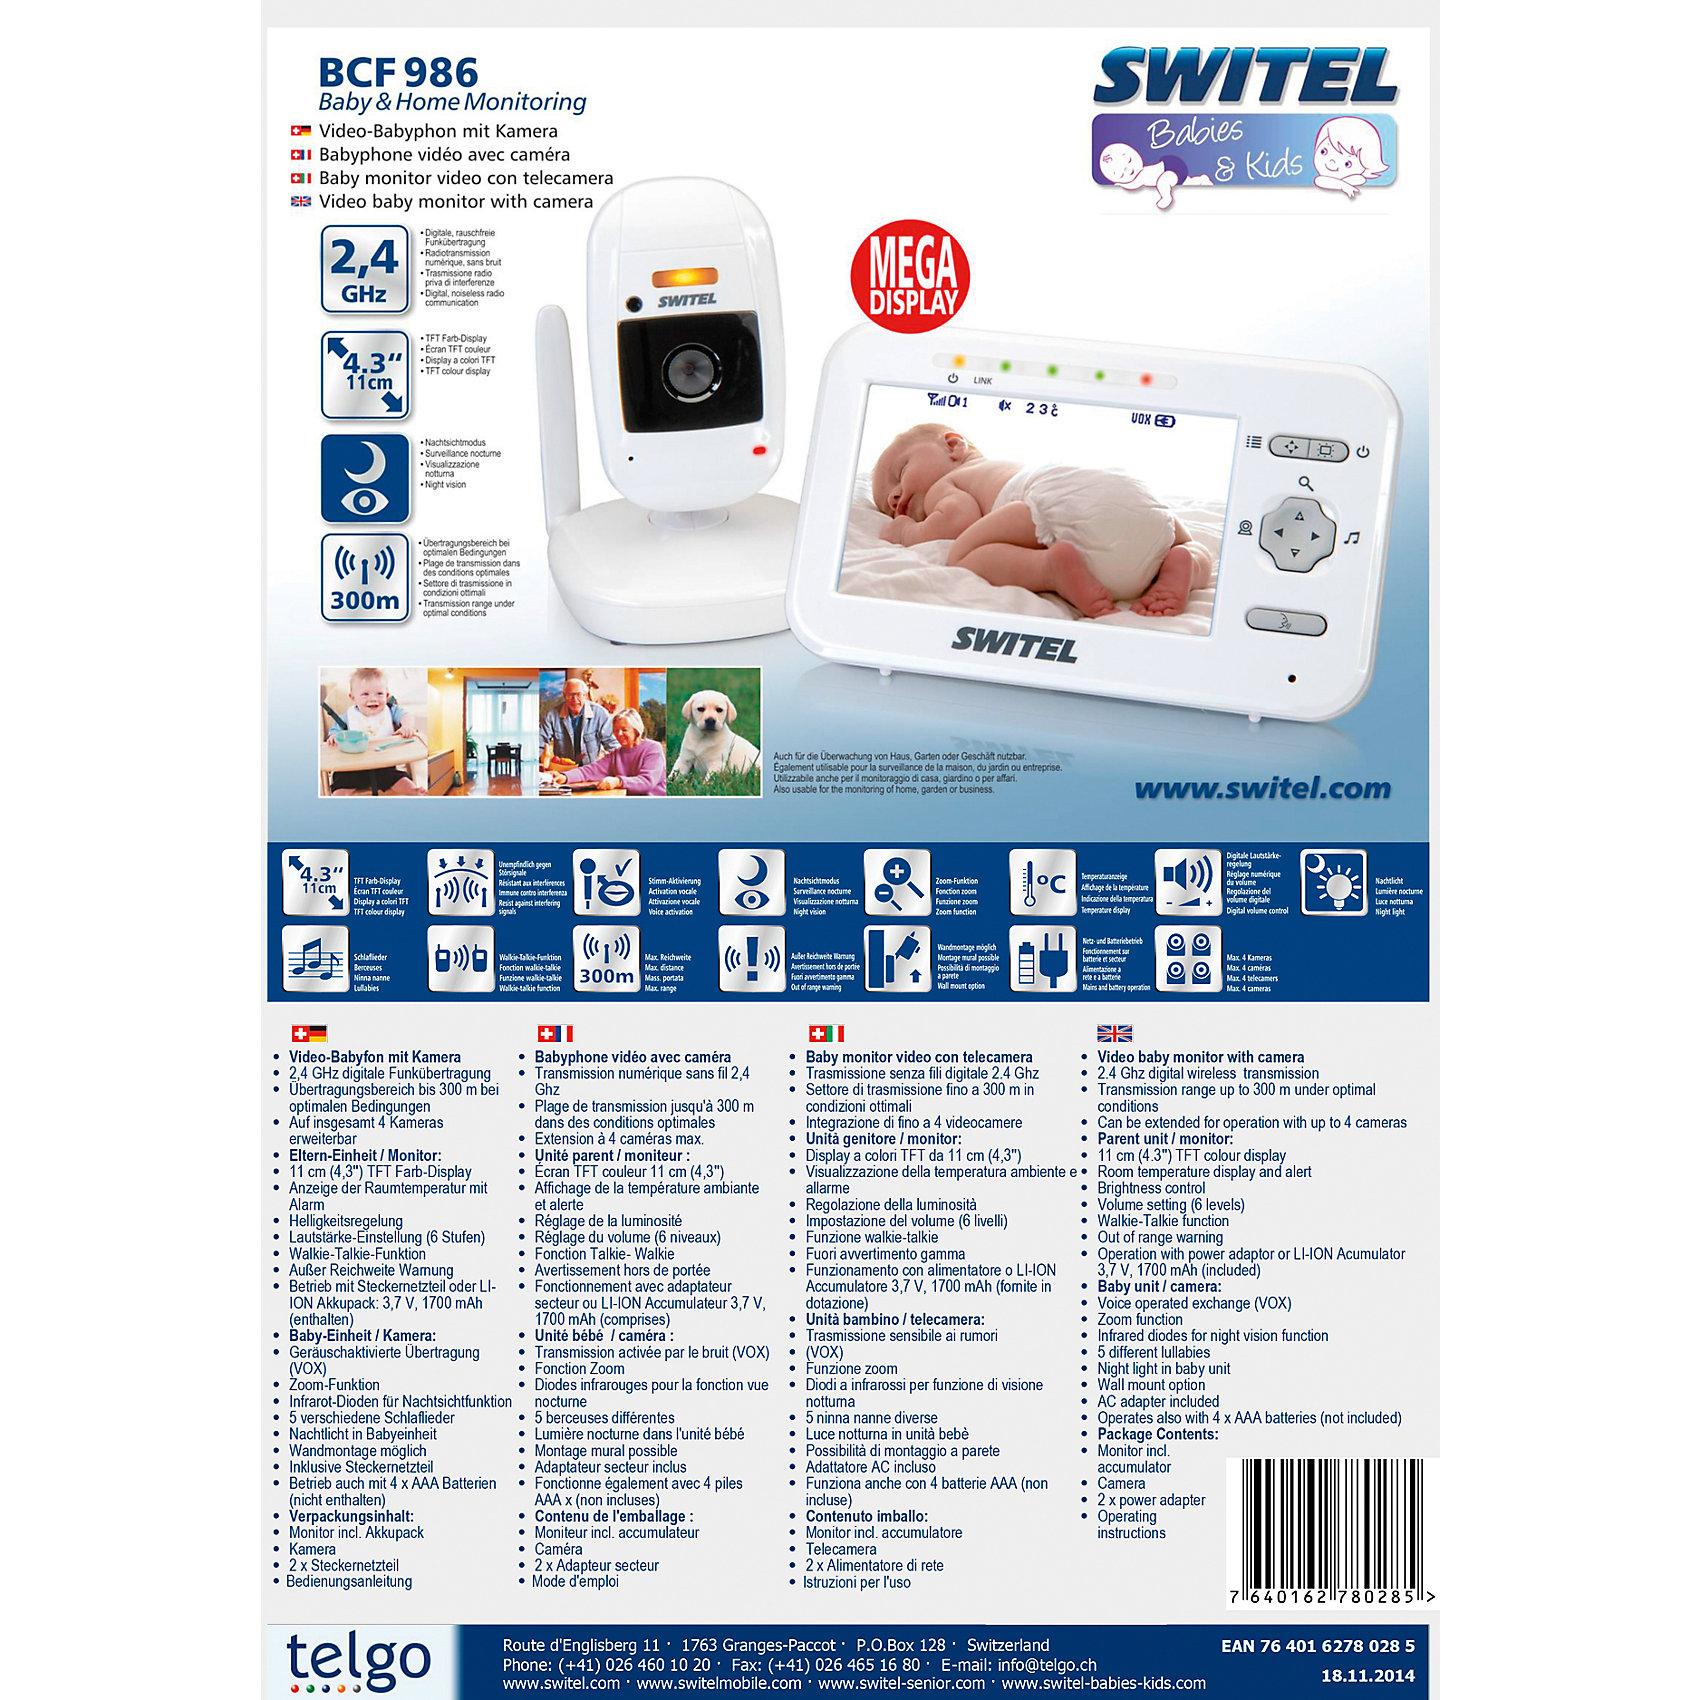 ��������� BCF986 Duo, Switel (SWITEL)